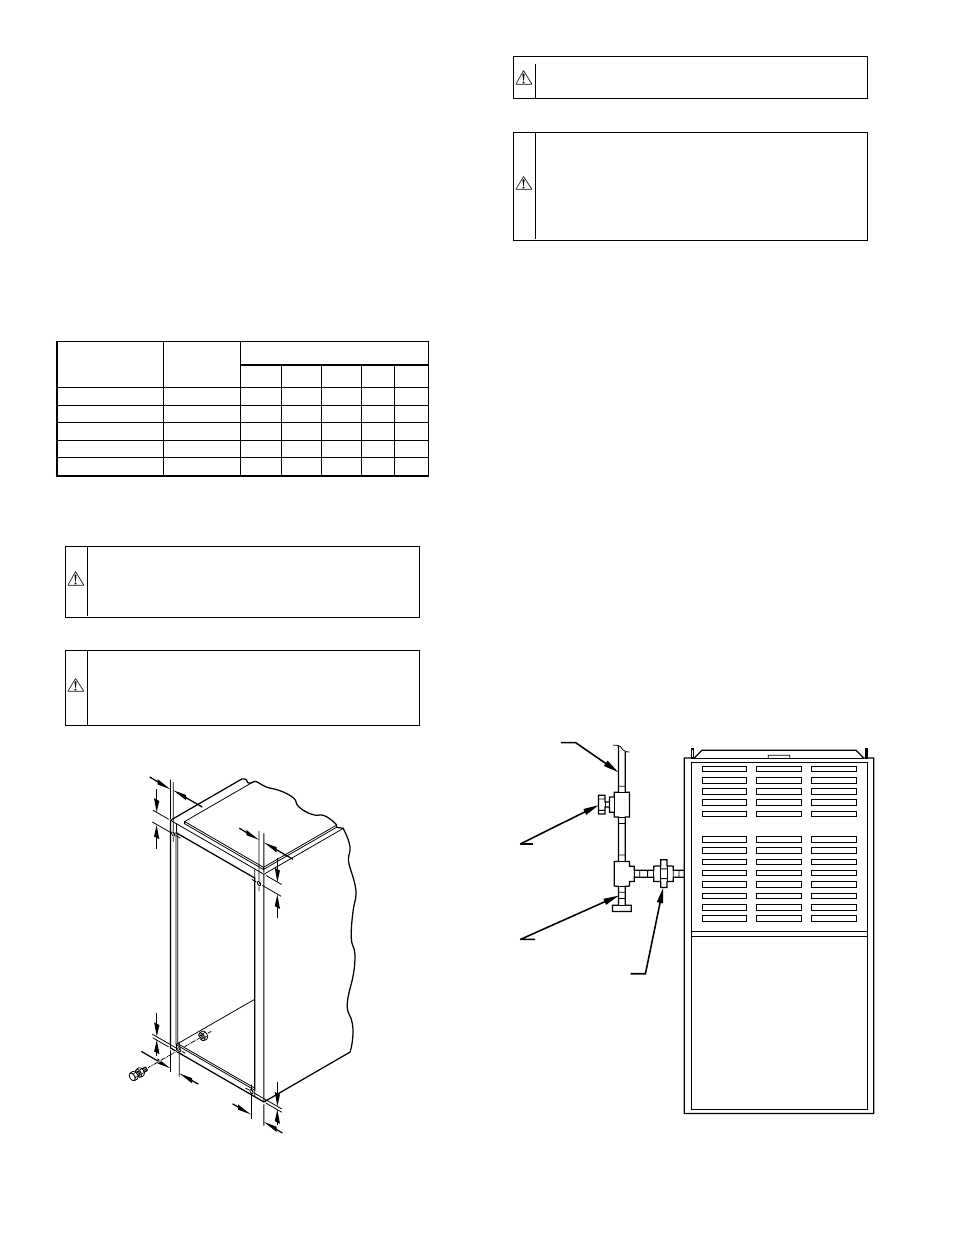 Bryant 395cav User Manual Page 8 20